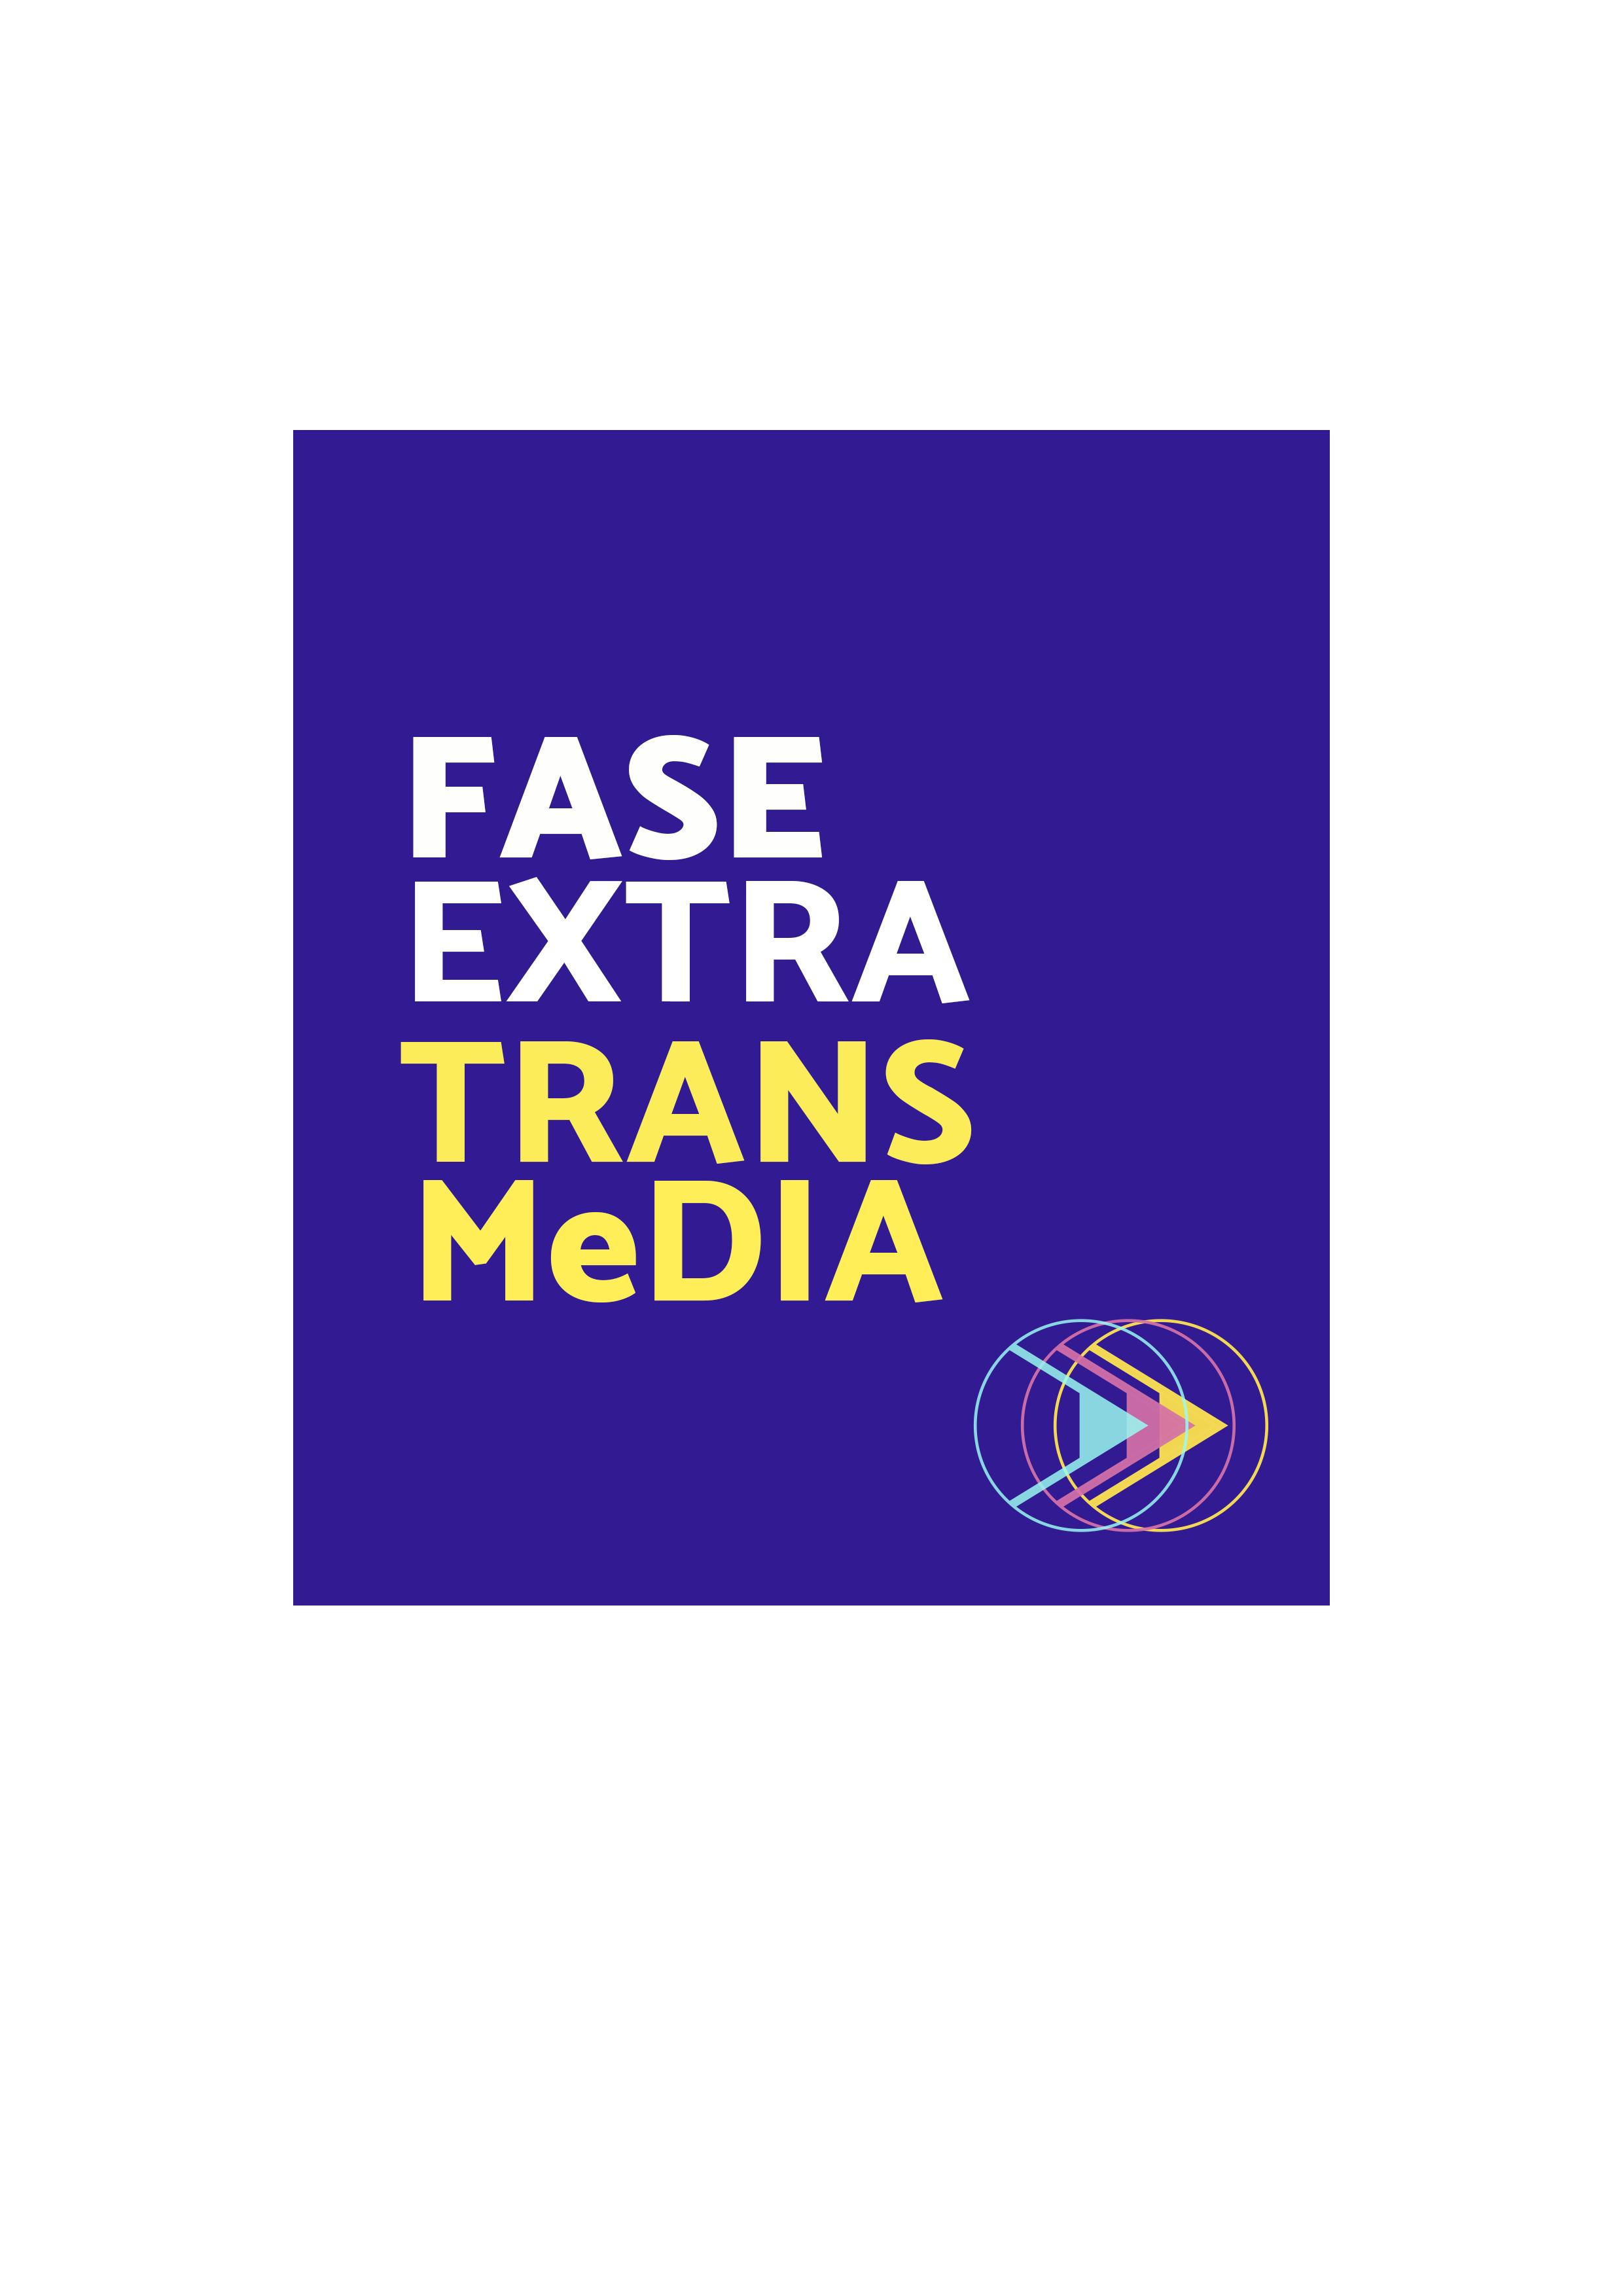 Fase Extra Transmedia